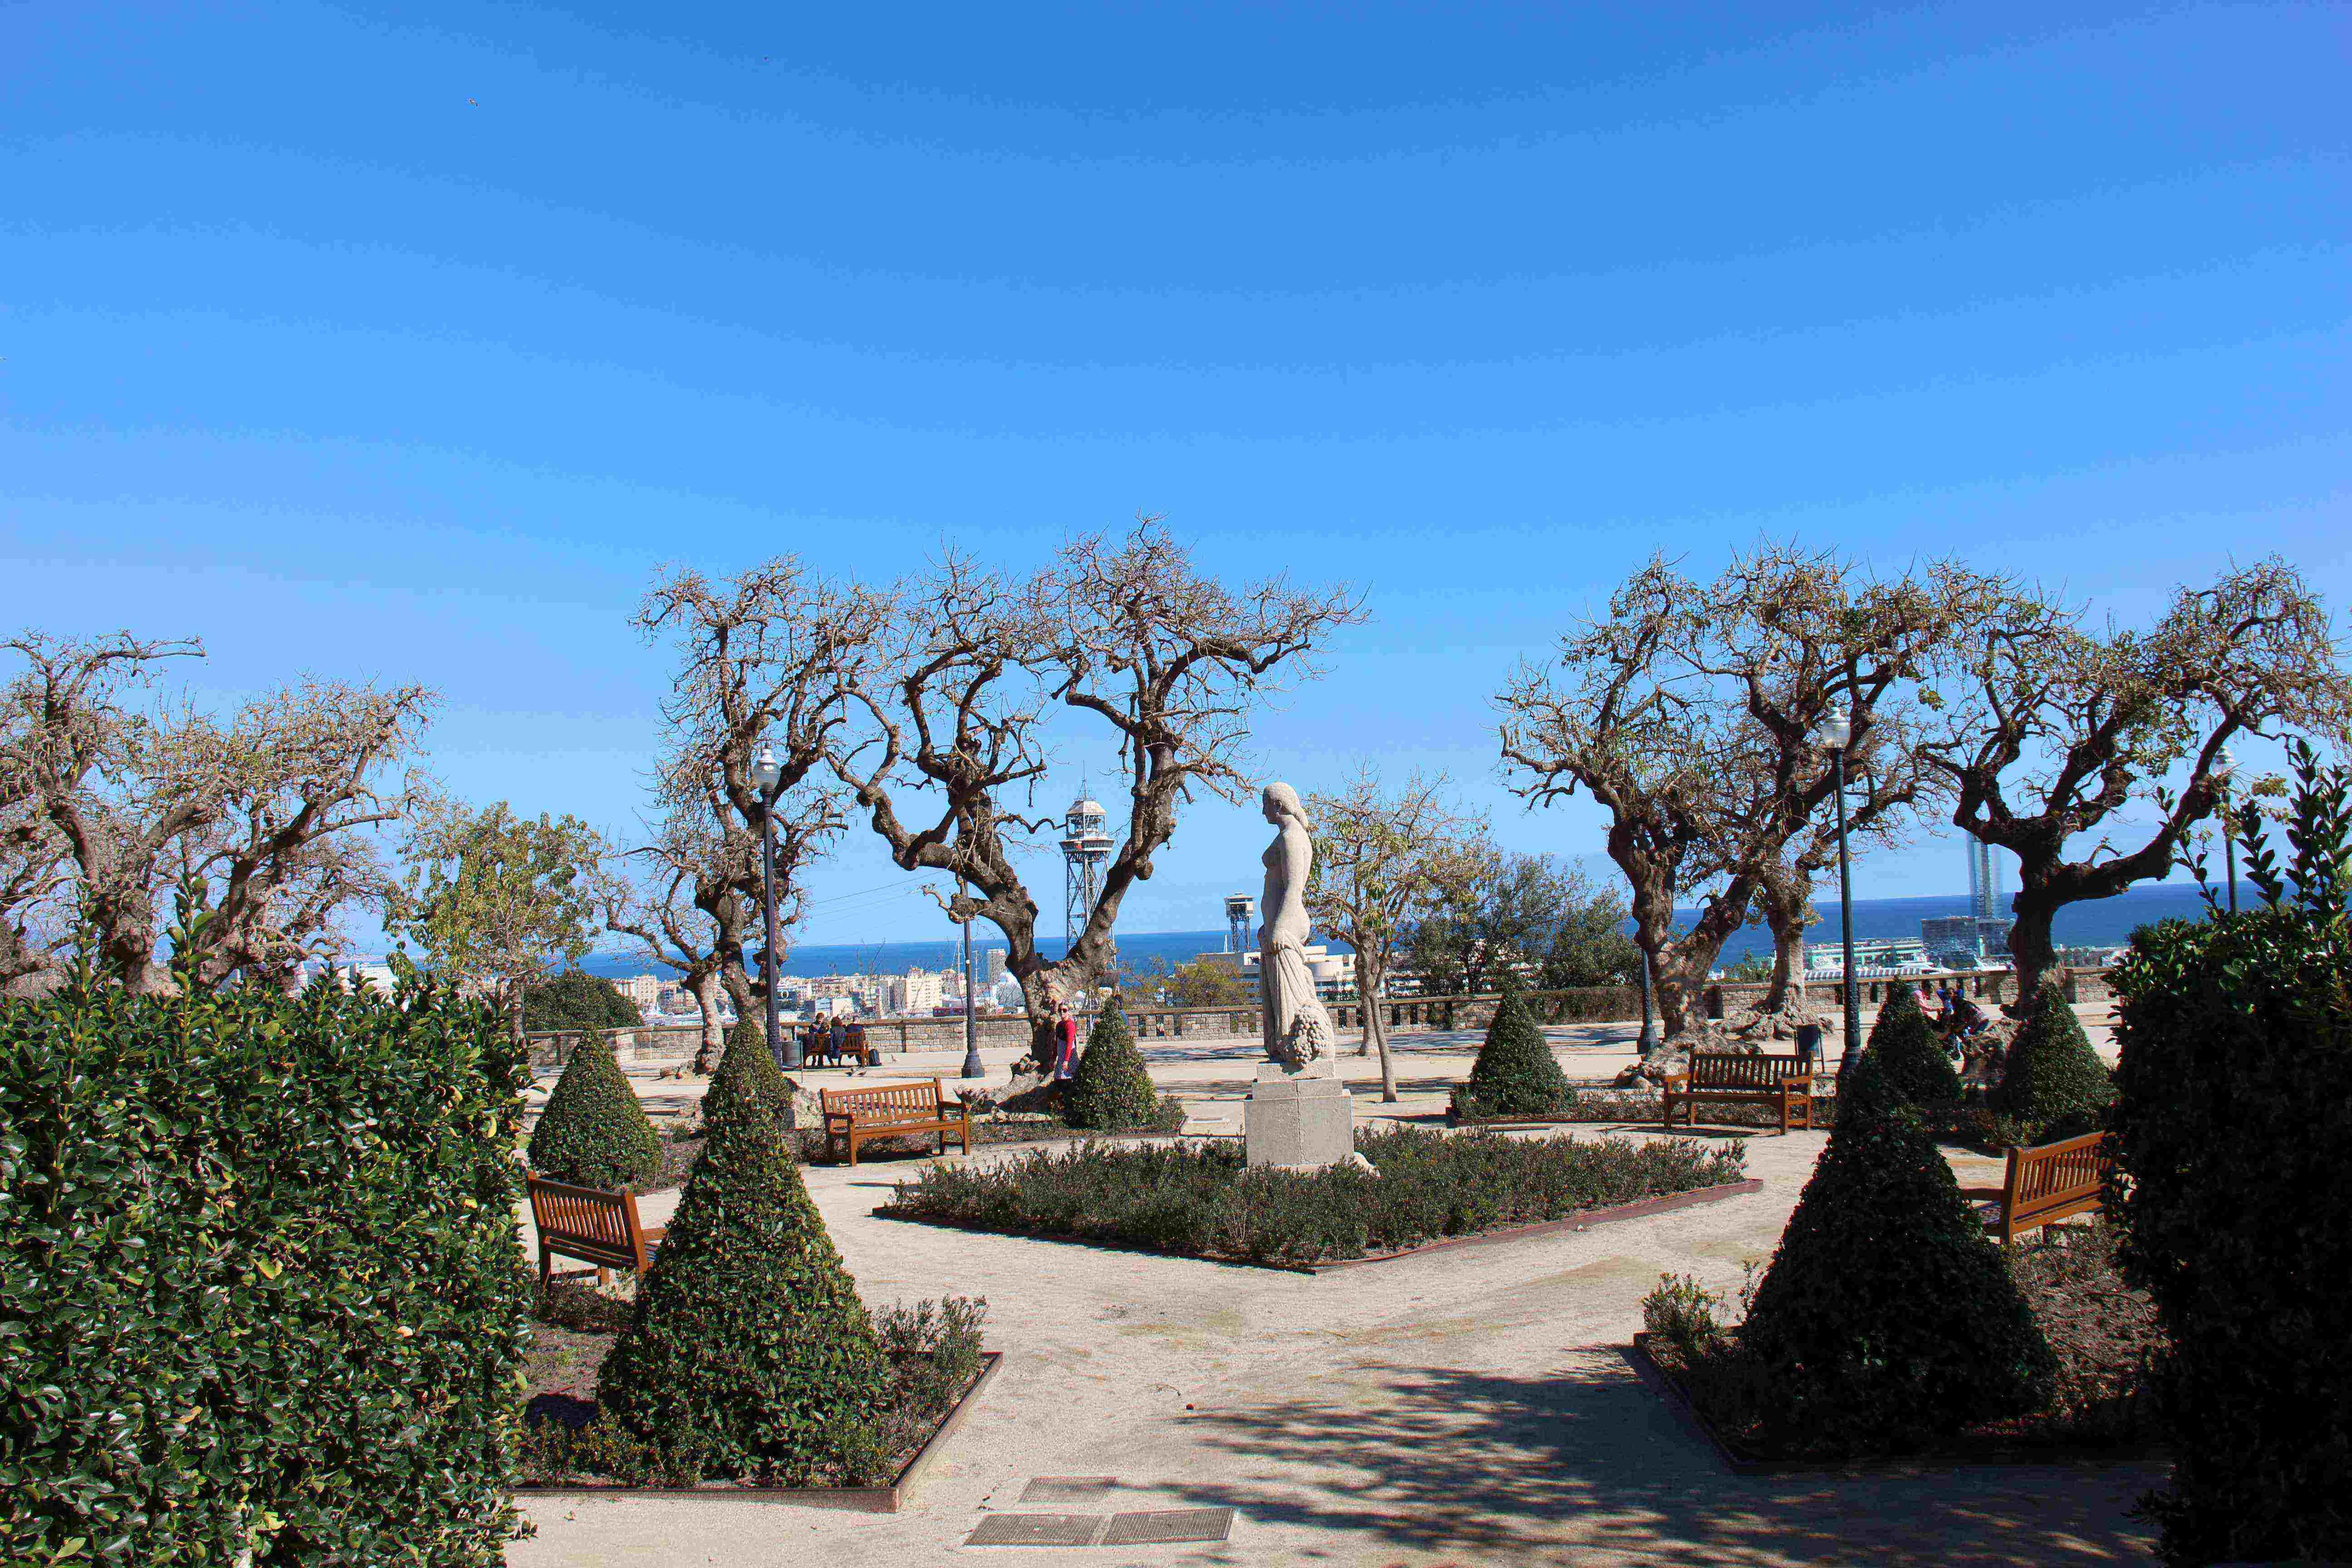 Forestier a montju c el jard n como obra de arte castell for Jardin de miramar